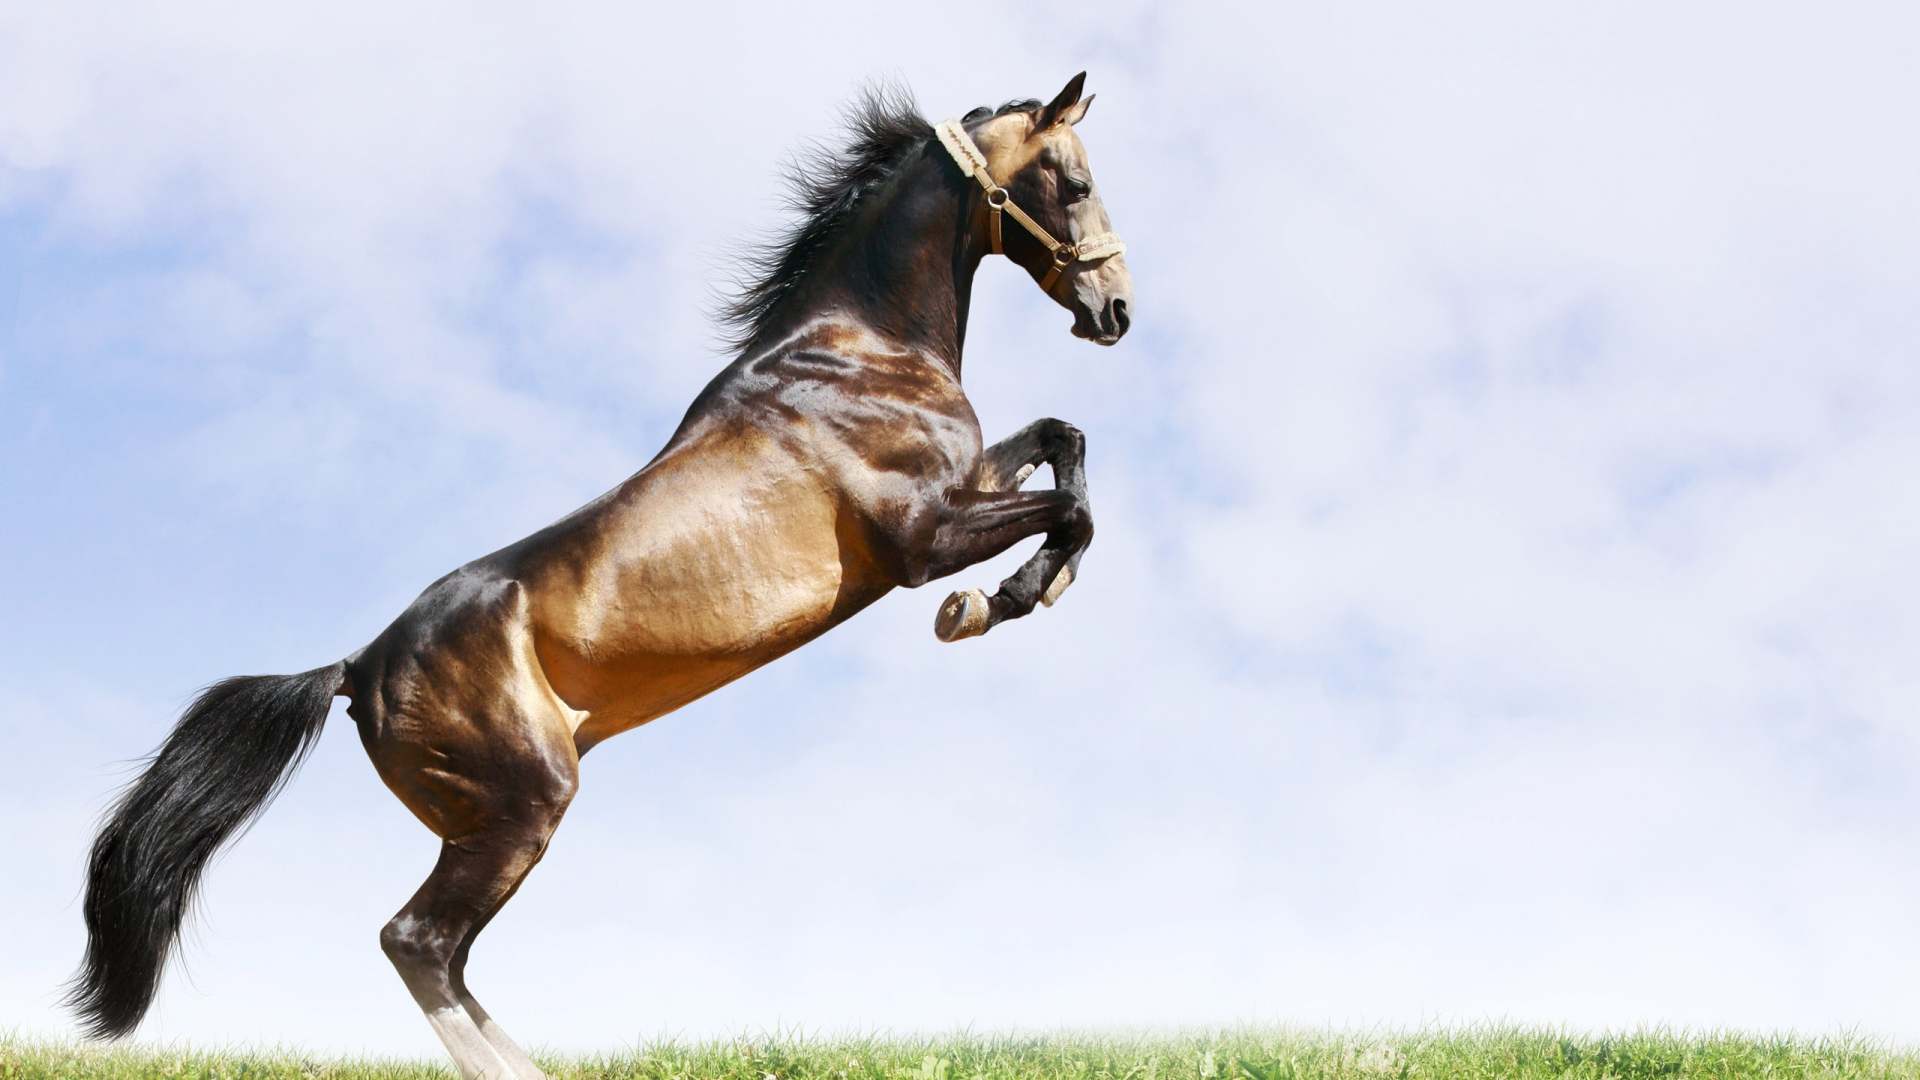 Download Wallpaper 1920x1080 Horse Jumping Grass Field Full Hd 1080p Hd Background